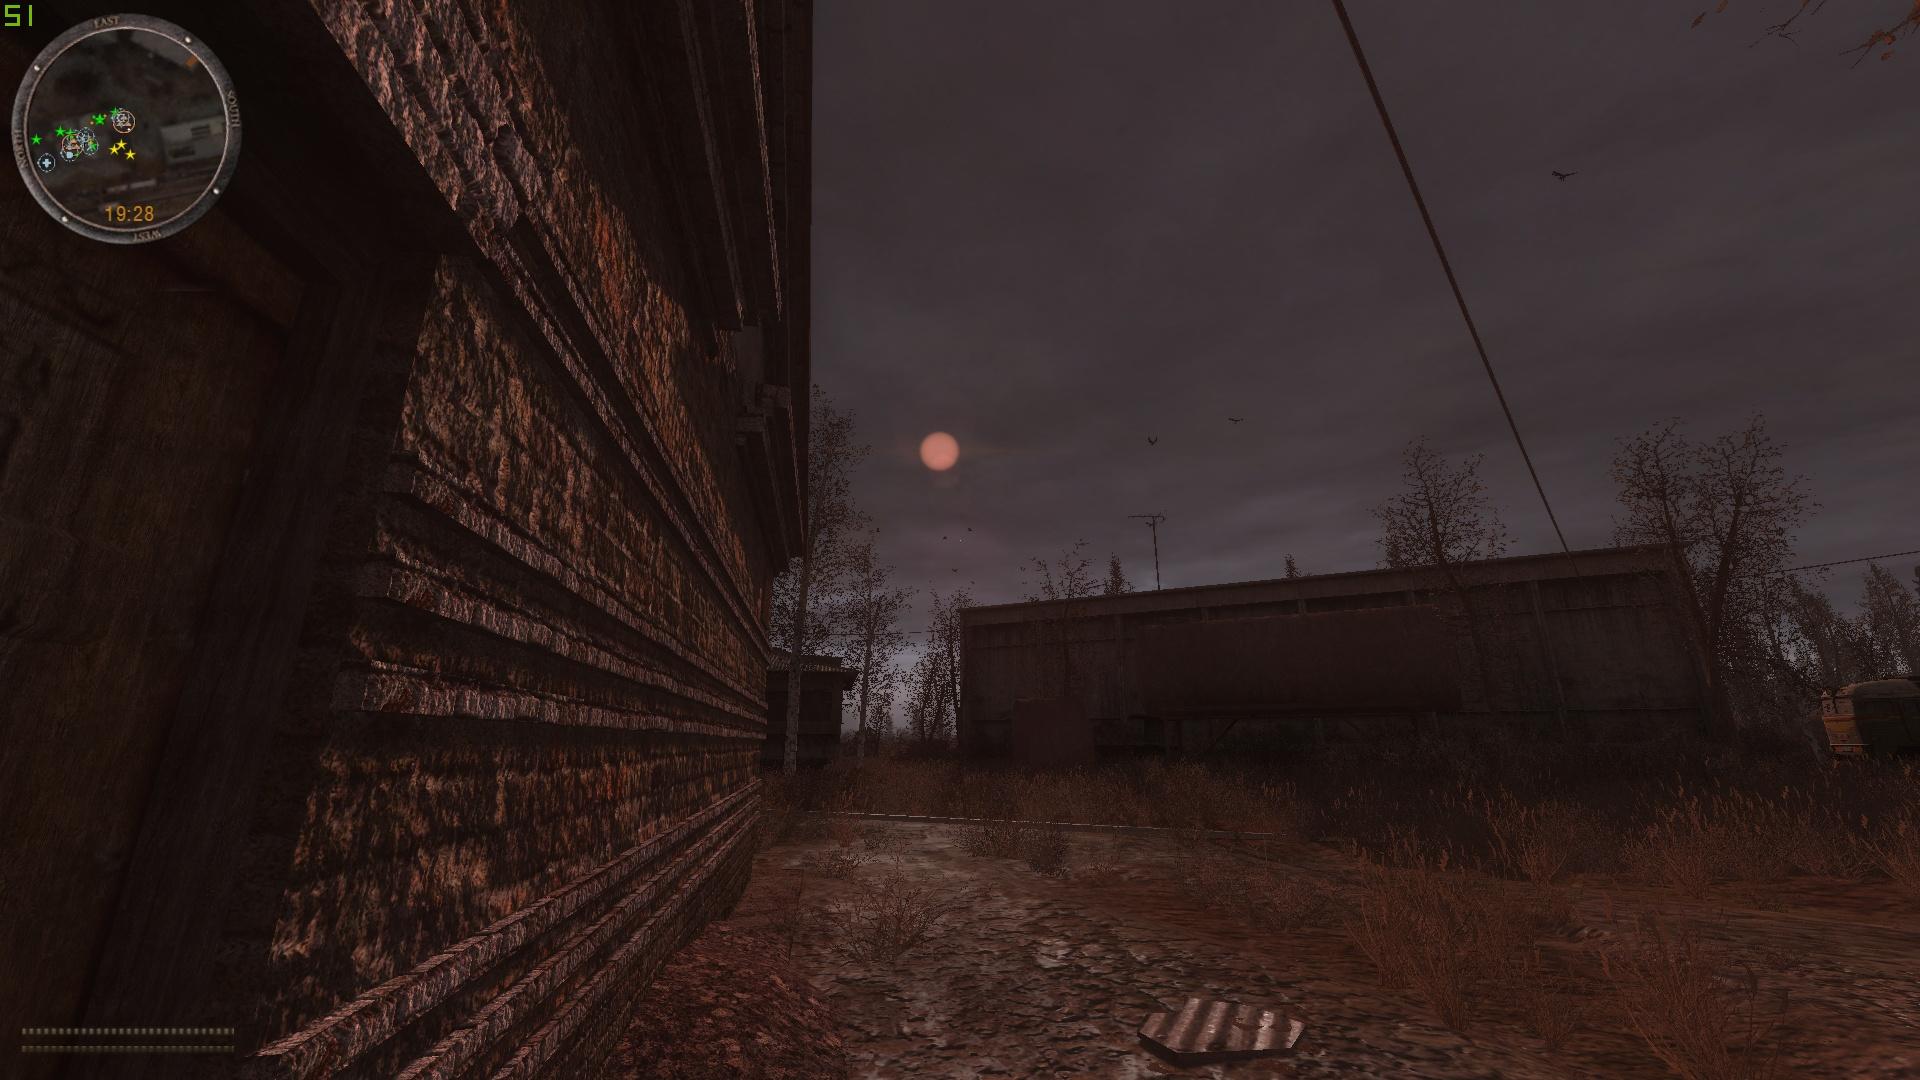 ss_Администратор_05-11-18_18-57-44_(jupiter).jpg - S.T.A.L.K.E.R.: Call of Pripyat